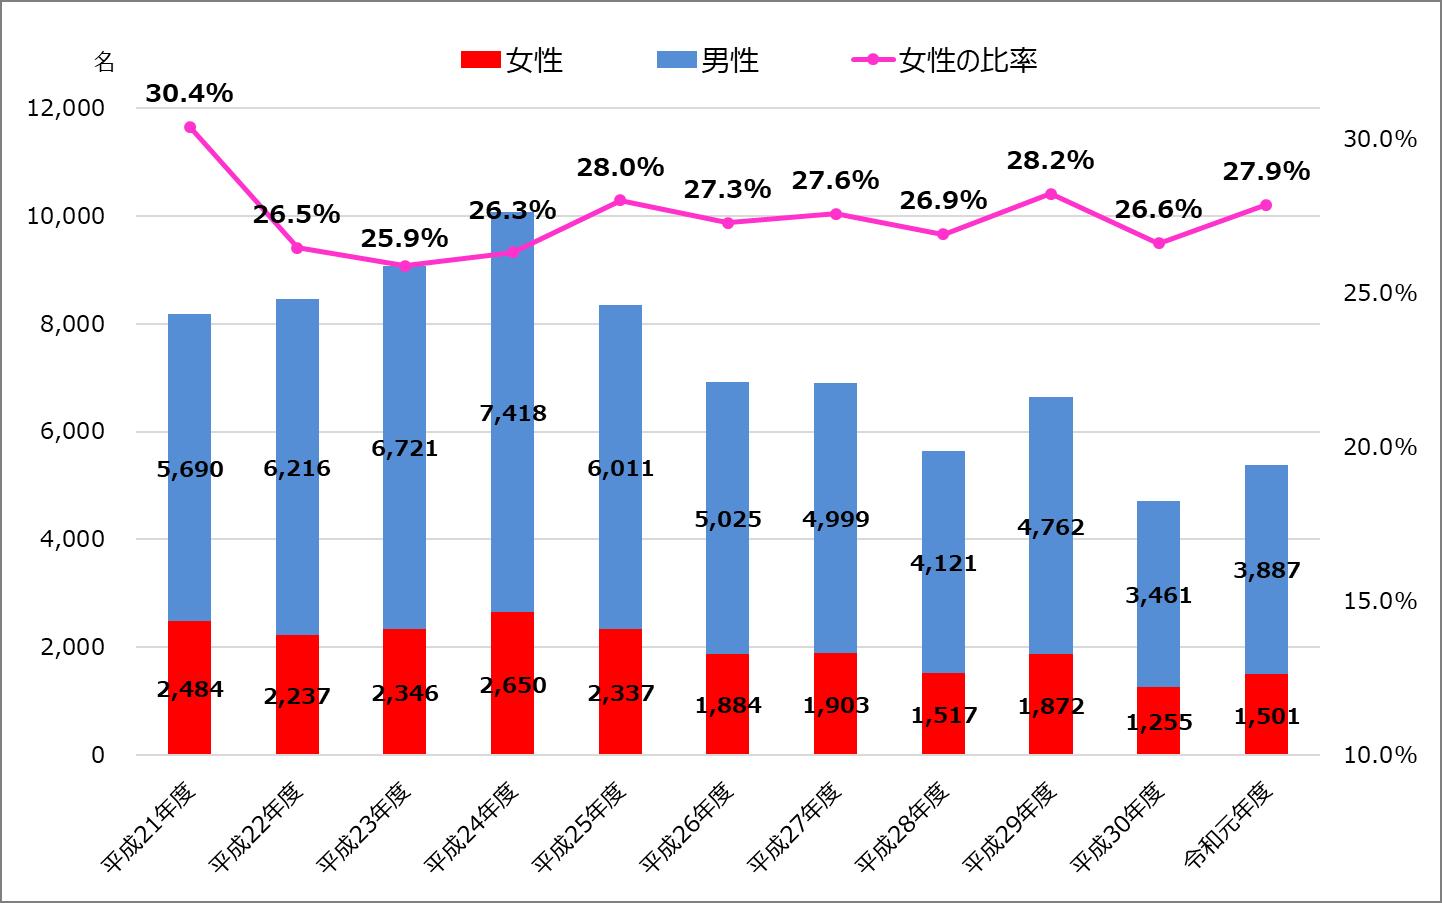 税理士試験_令和元年度_2019年_合格者に占める女性数・比率の推移